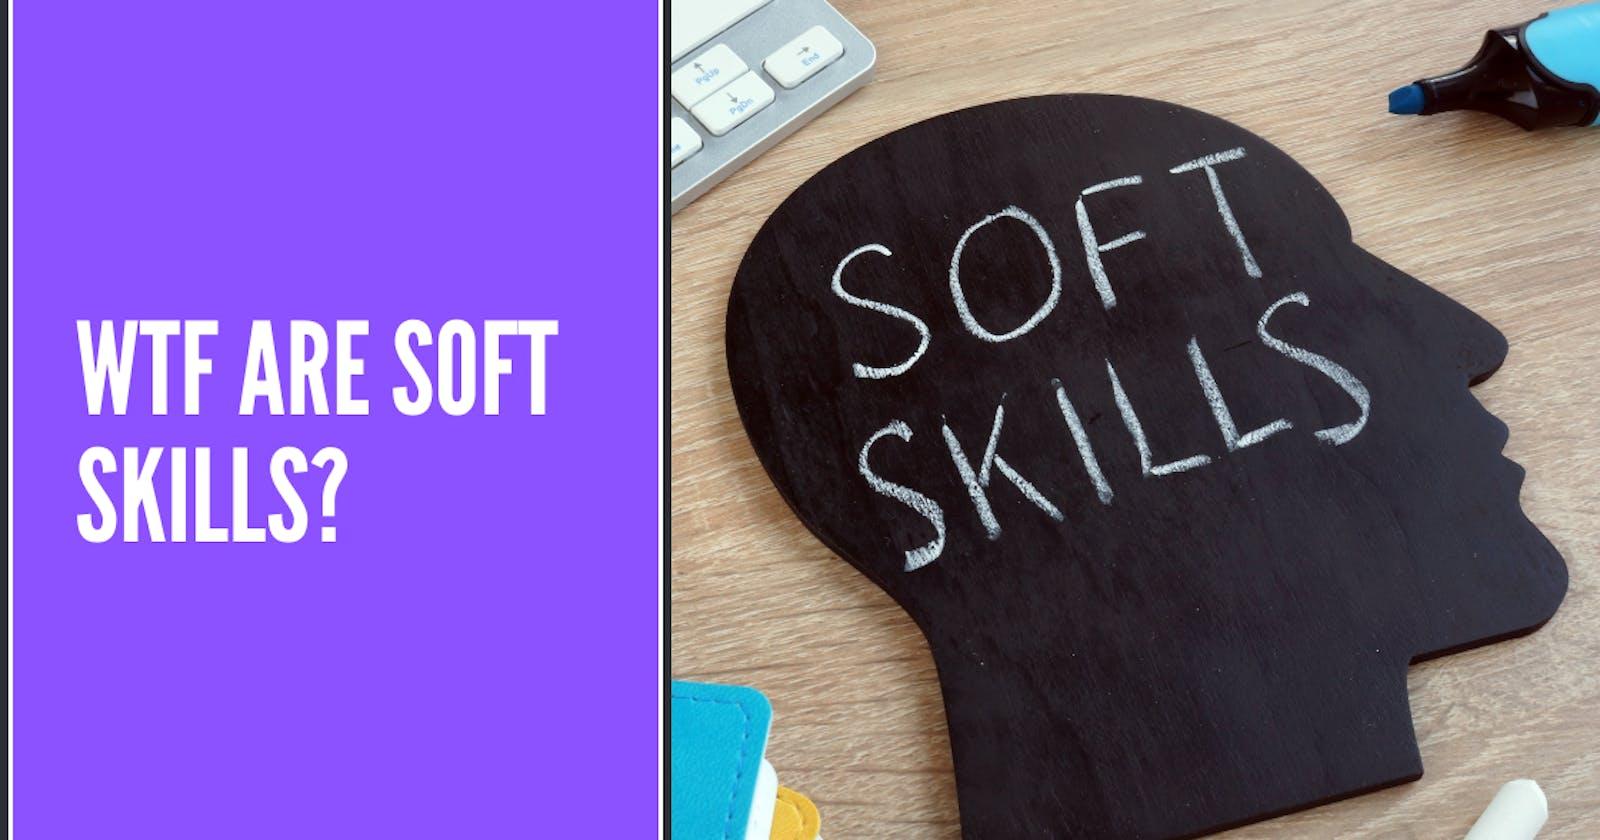 WTF are soft skills?